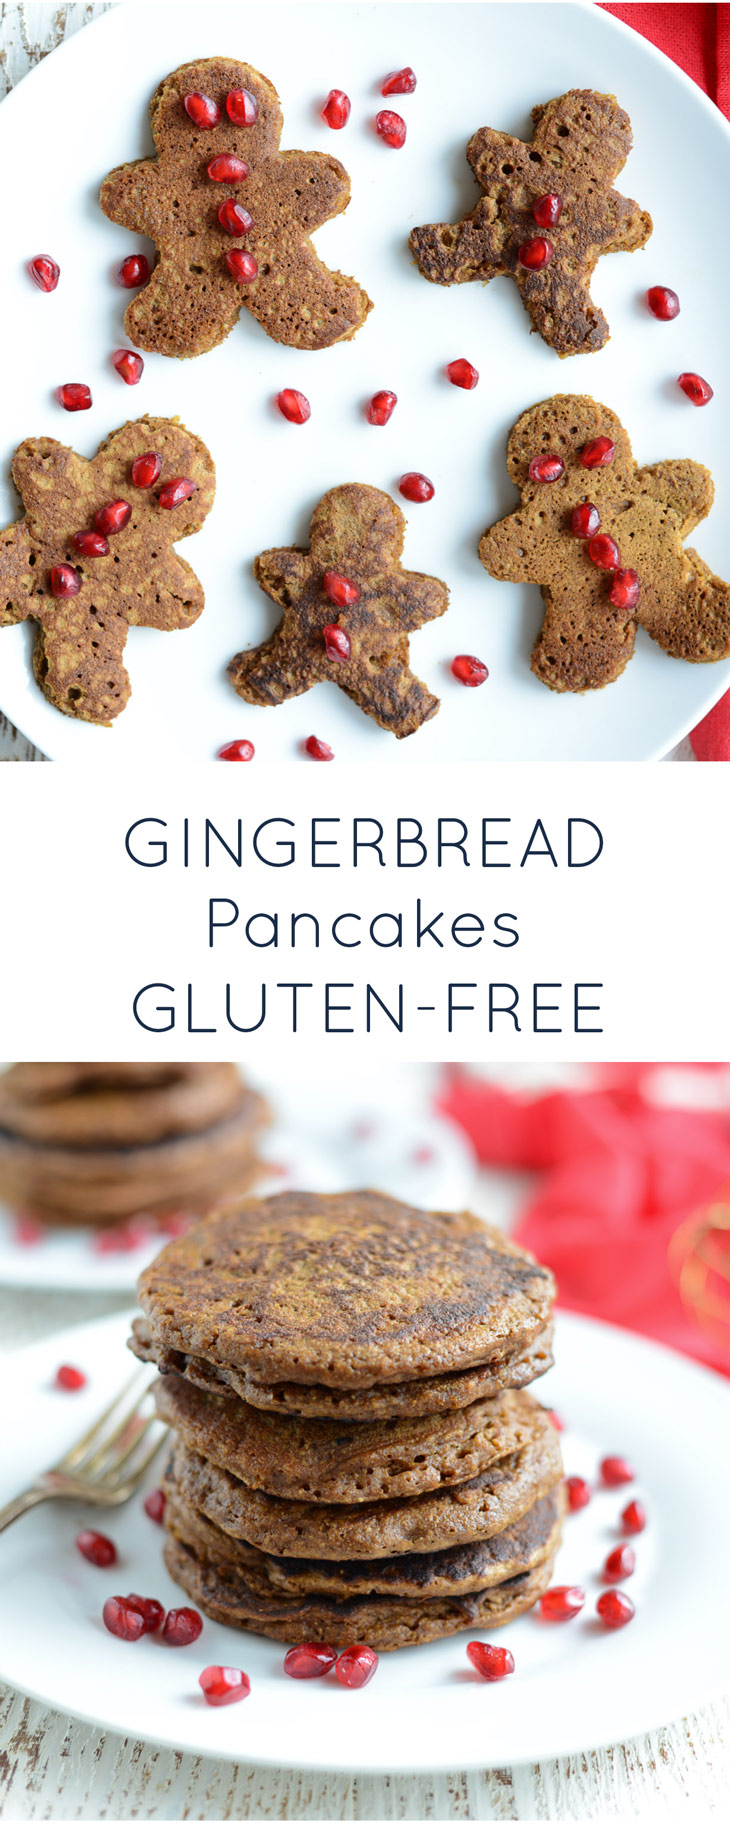 Gluten Free Gingerbread Pancakes {dairy-free, nut-free}